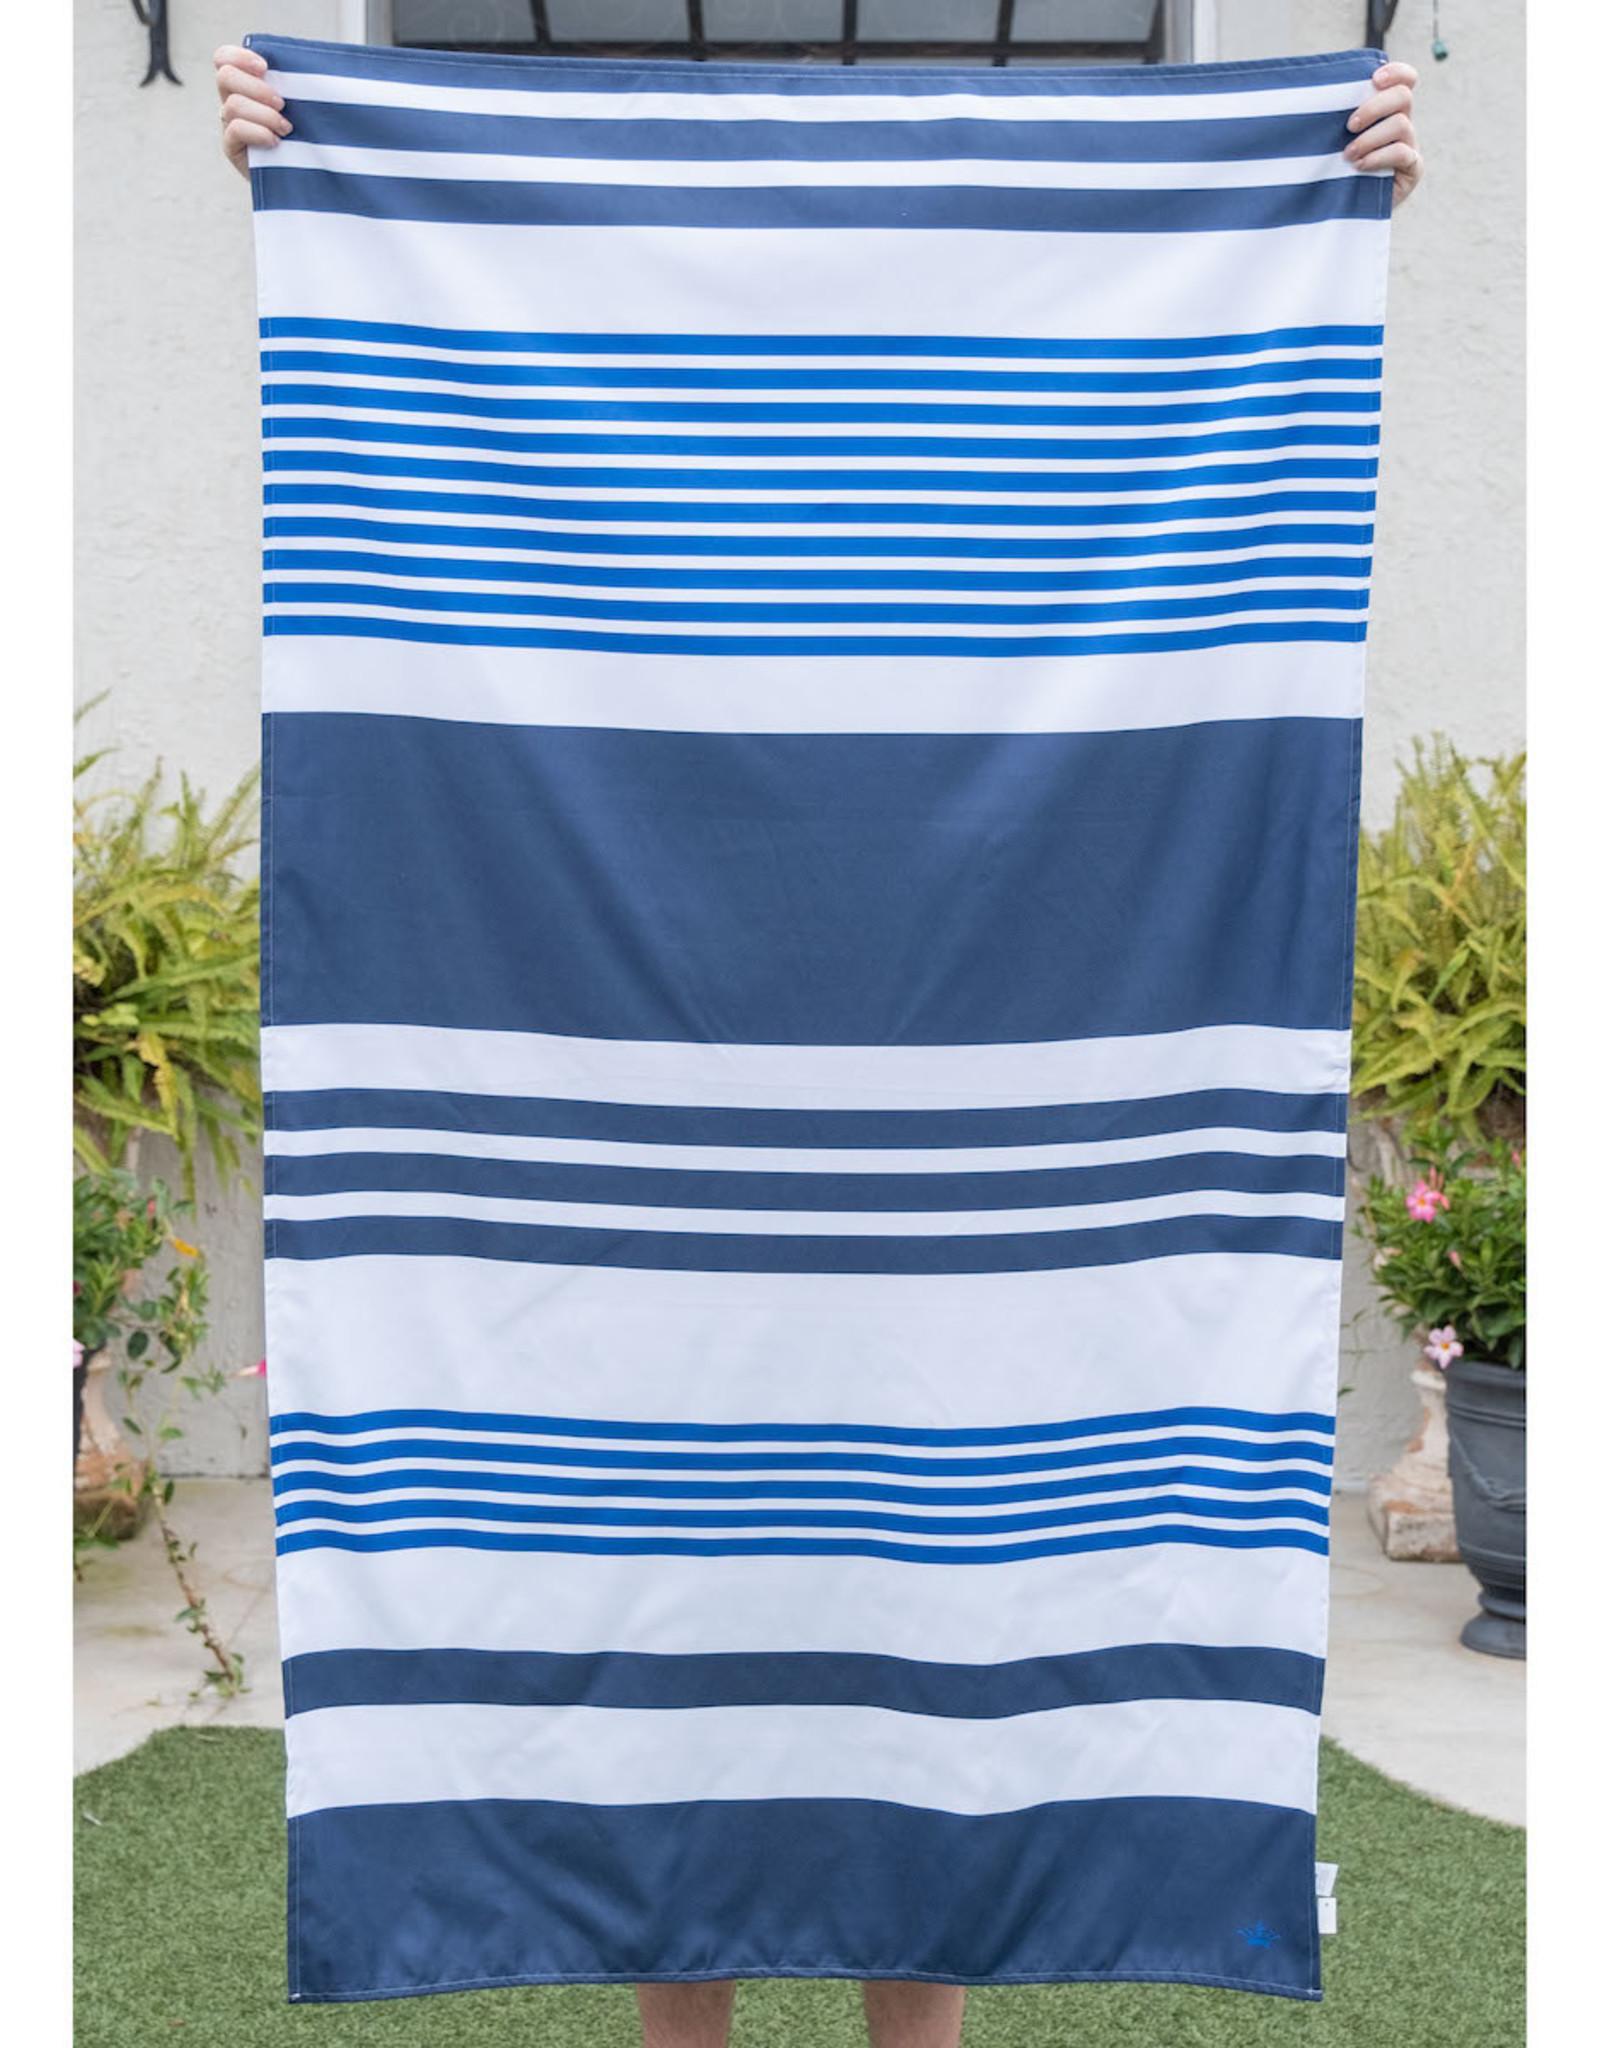 Microfiber Beach Towel - Blues